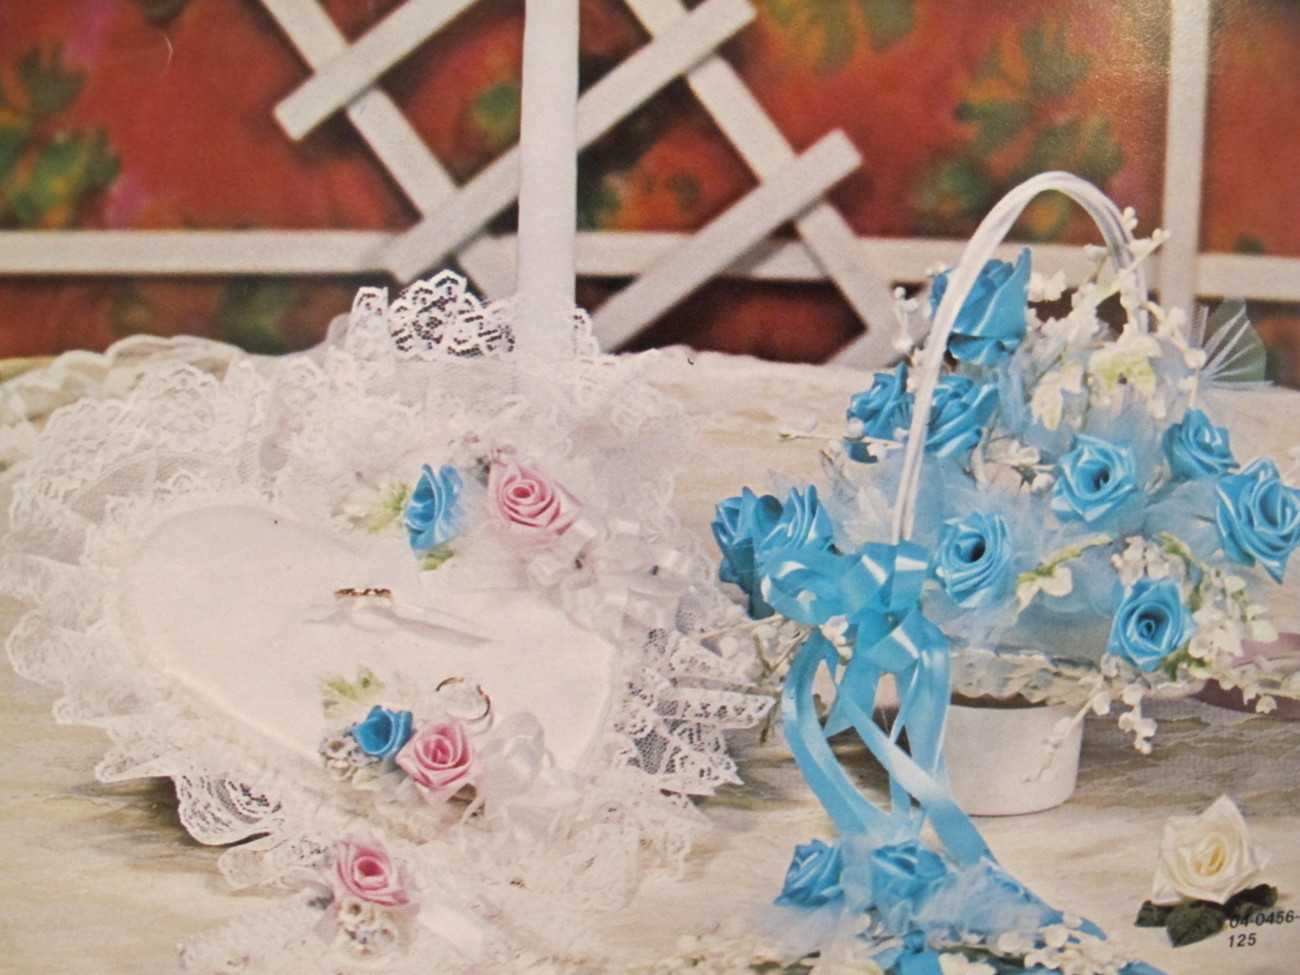 Keepsake Ribbon Roses Patterns Weddings Cake Tops Flowers Baby Bassinets etc